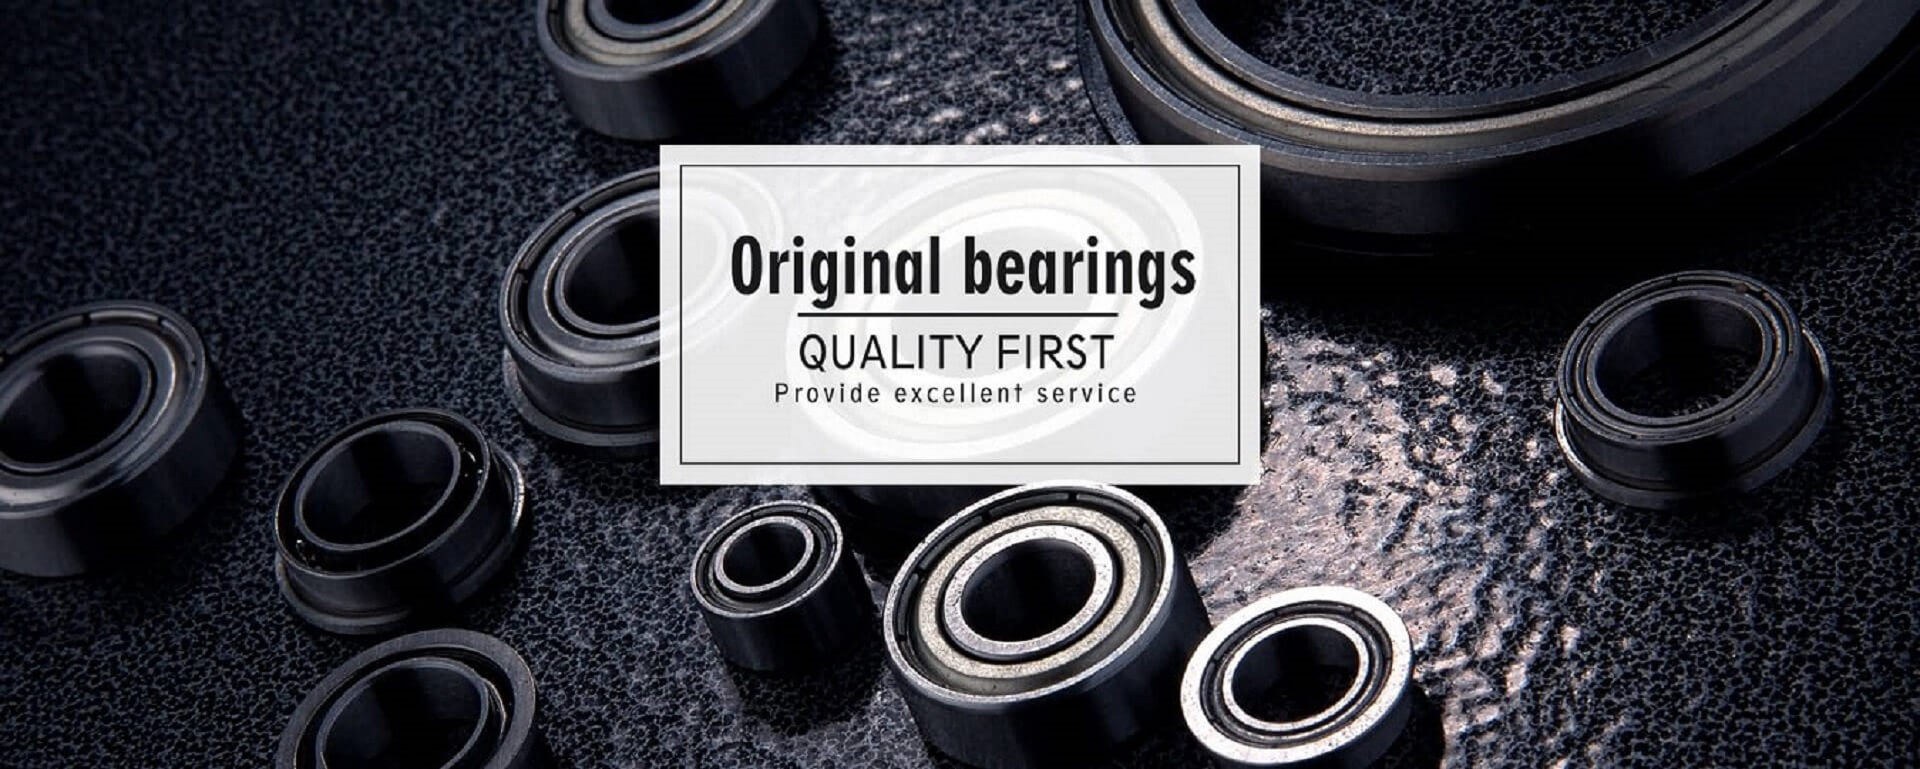 supply ntn bearing-fag bearing-nachi bearing-nsk bearing